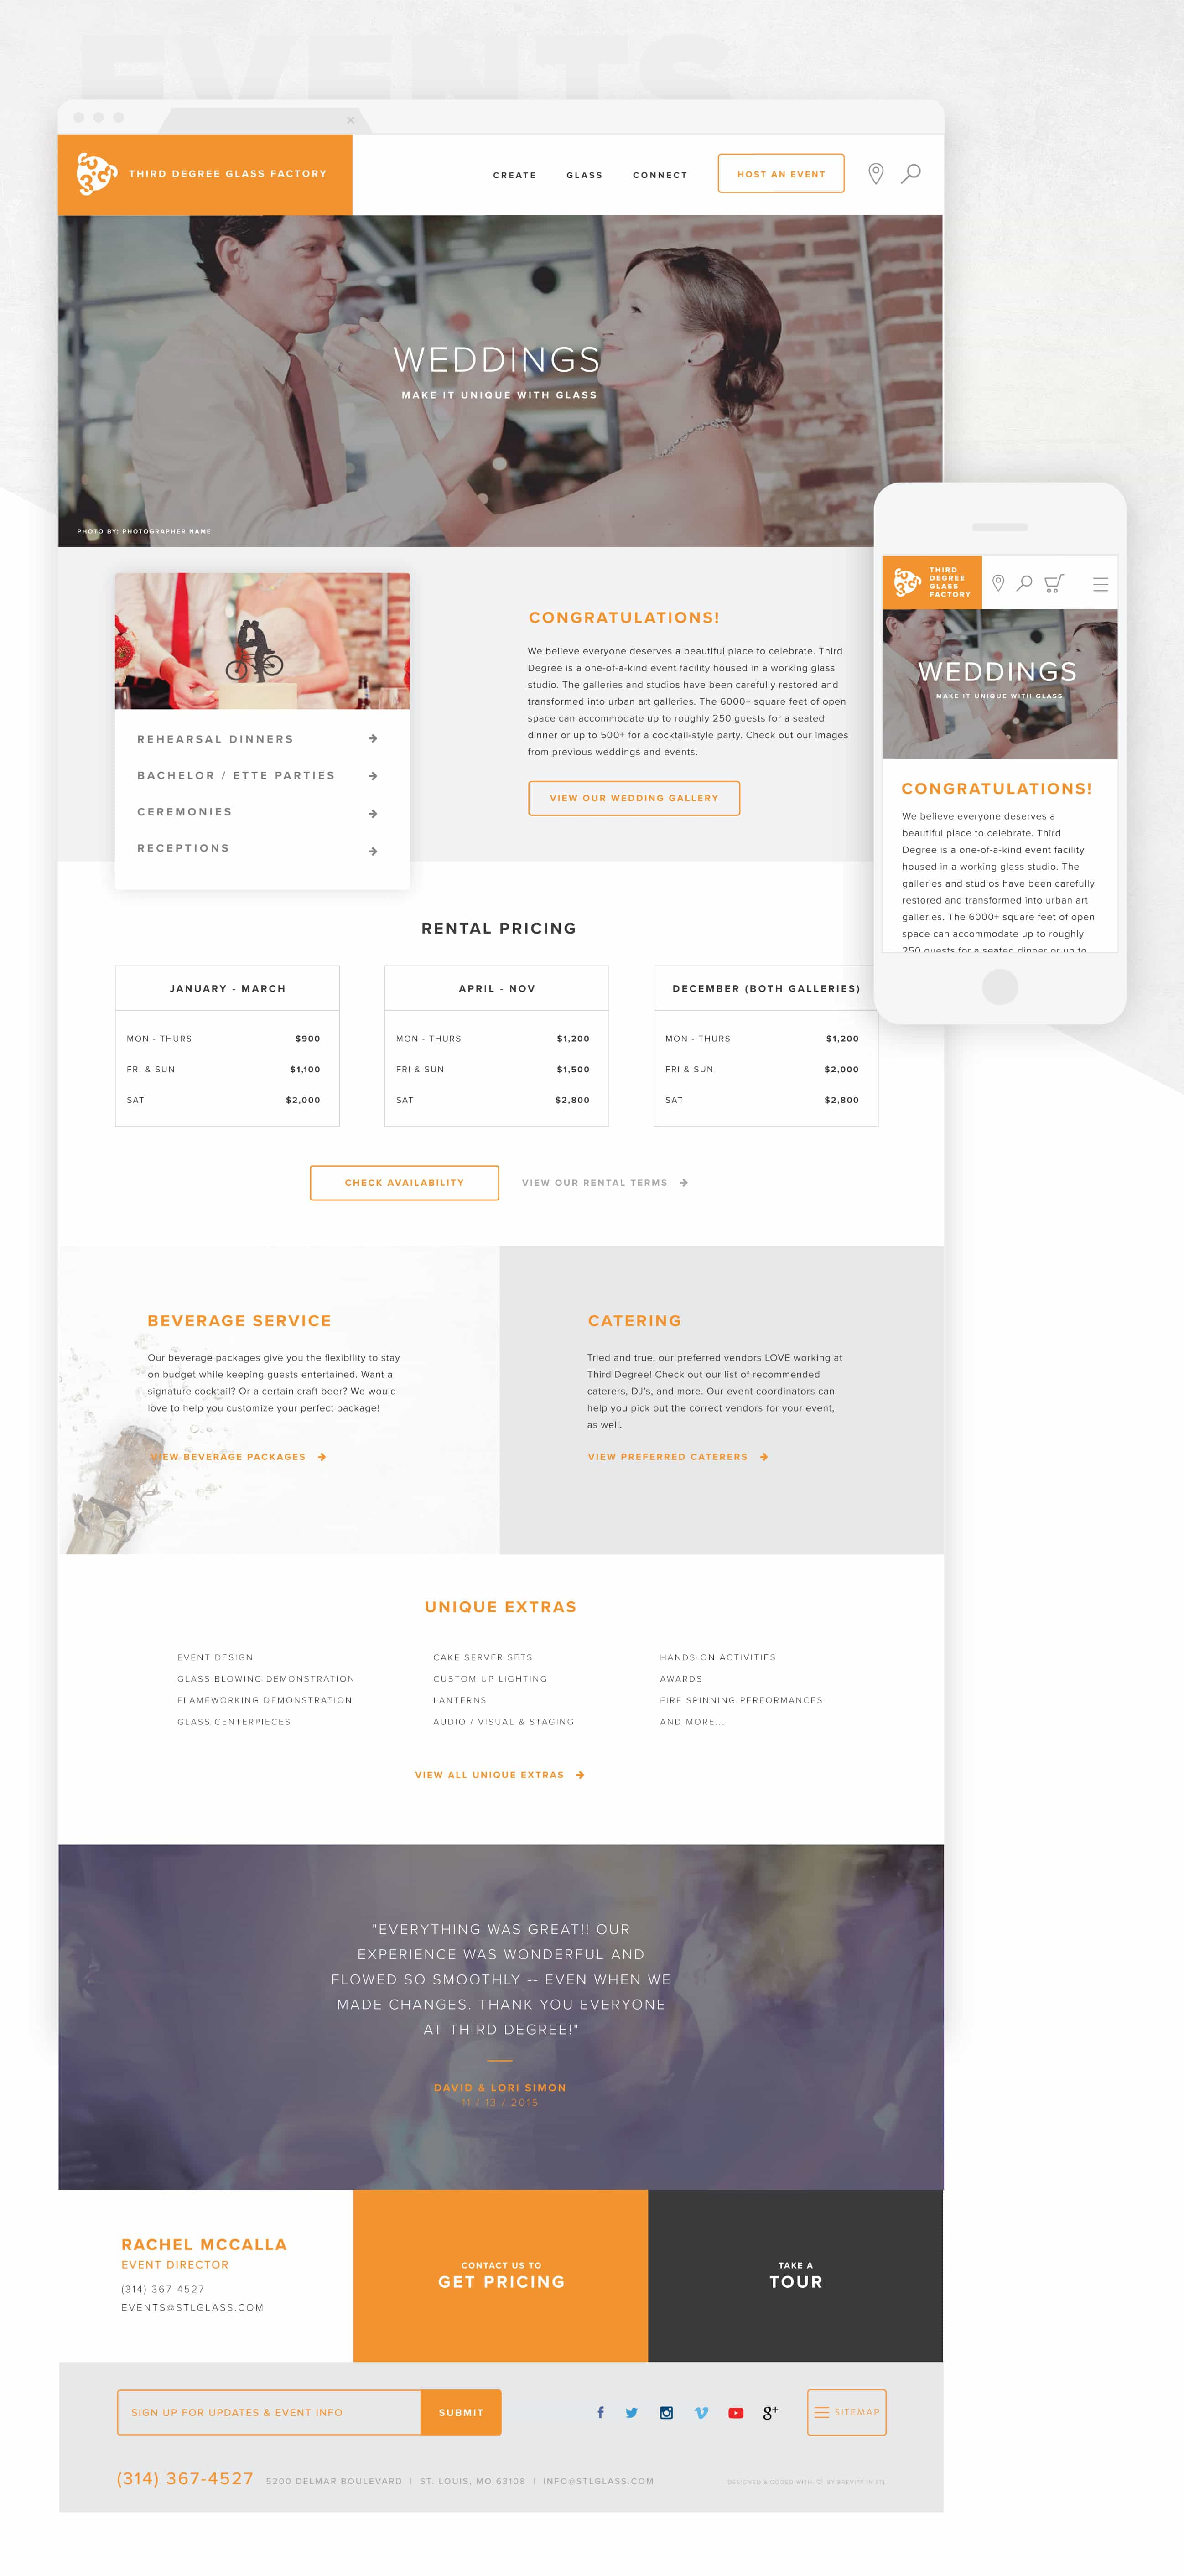 Mobile Optimization Ecommerce – Best Mobile Store Design